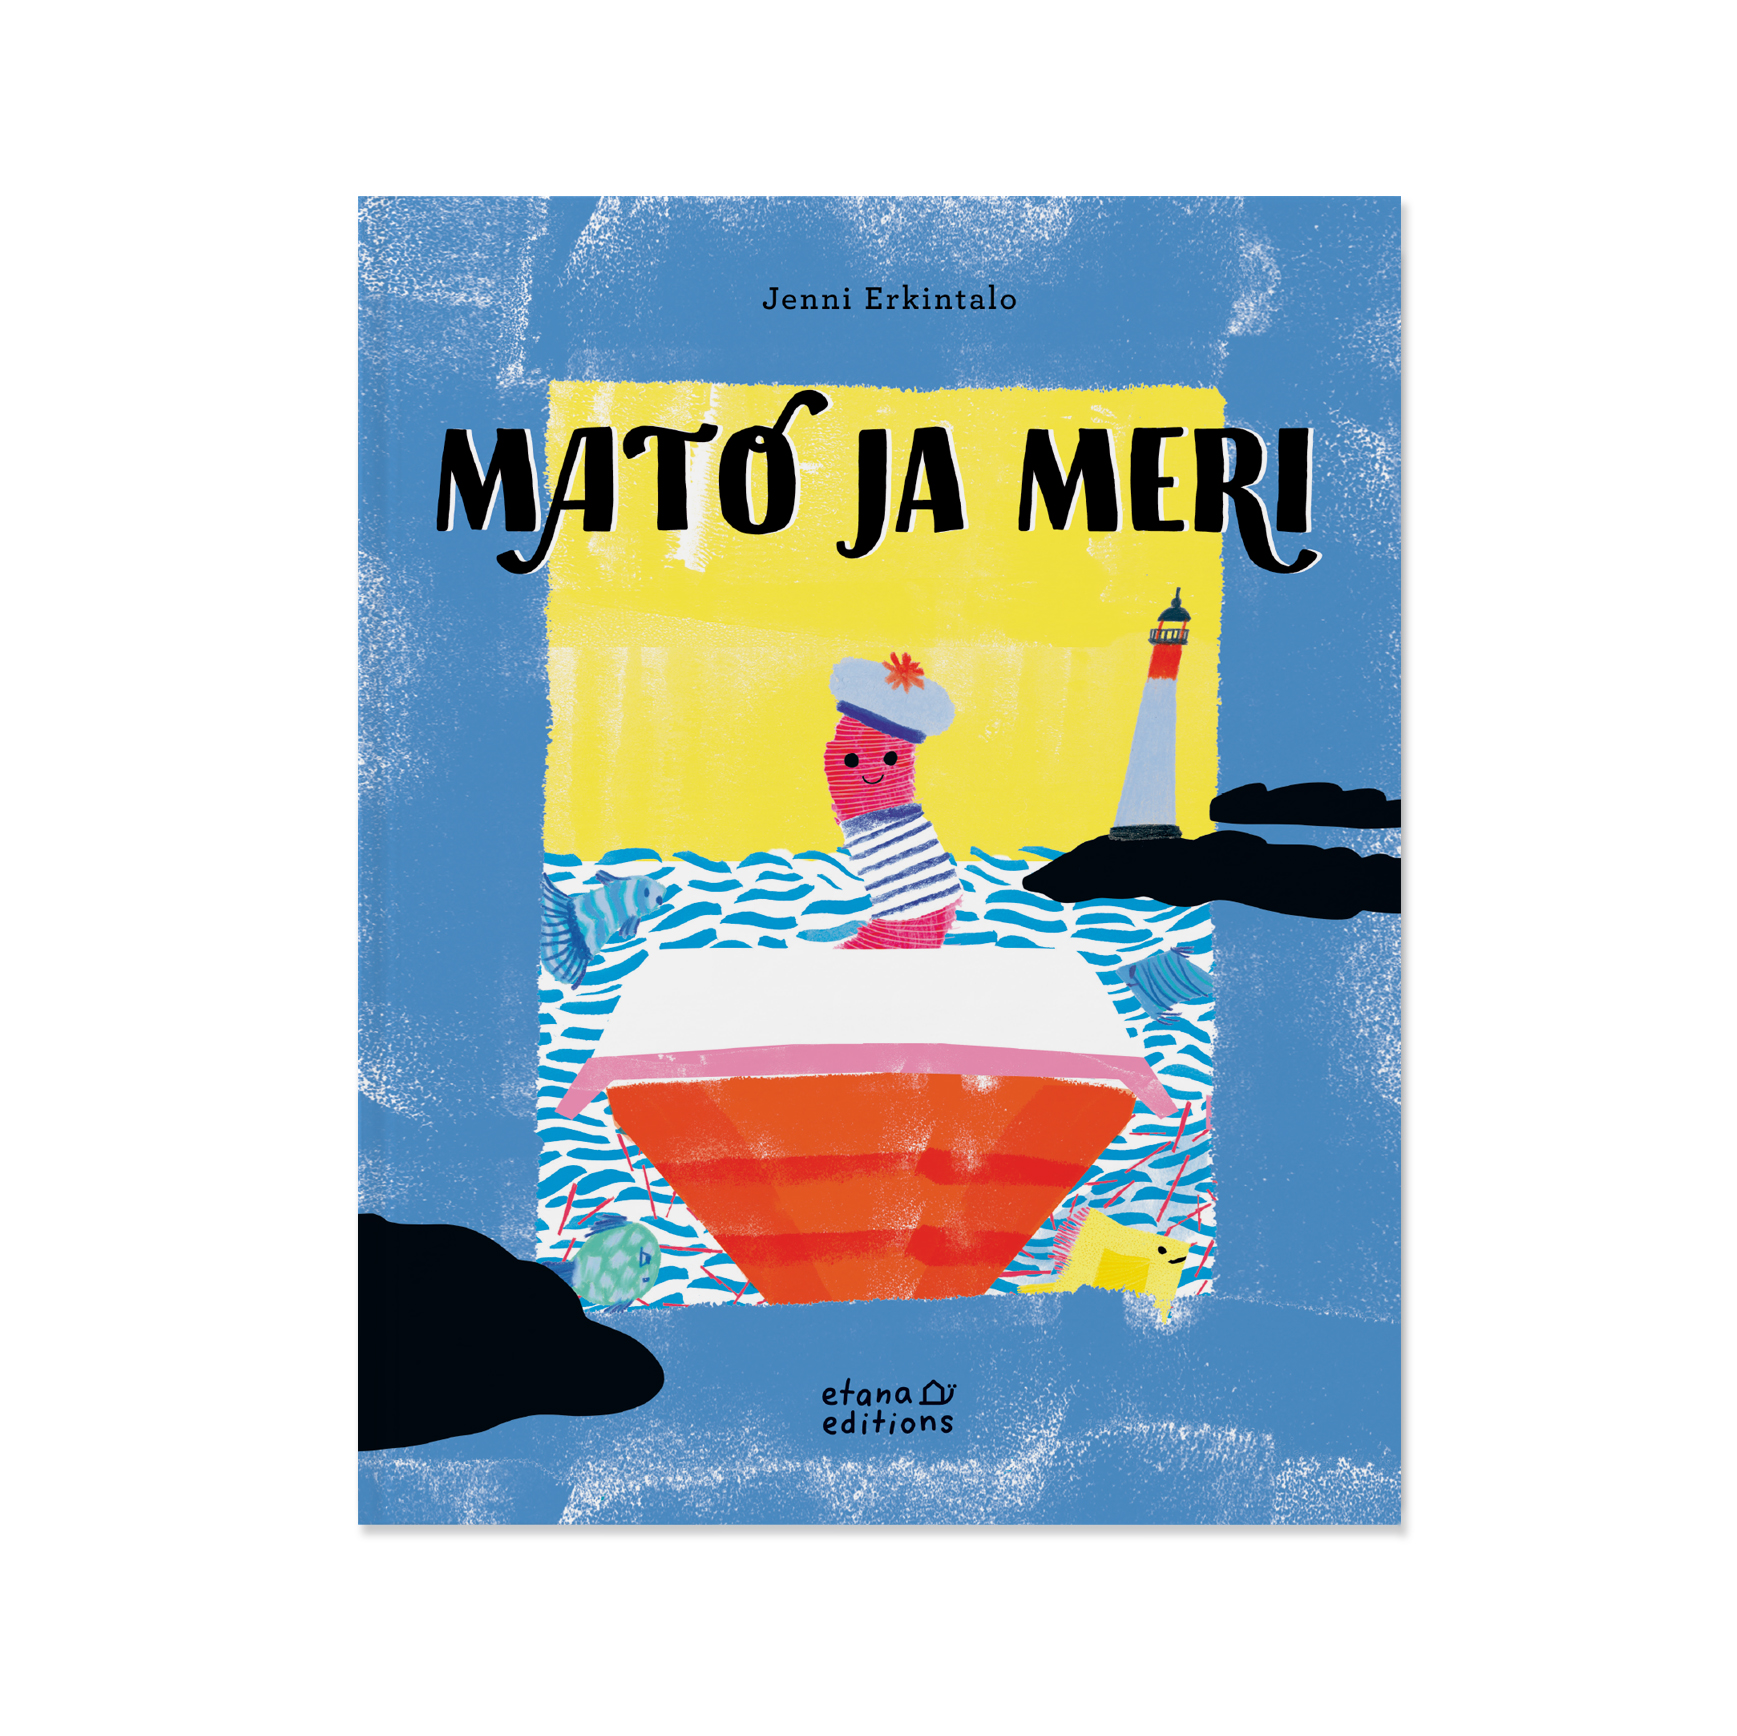 Cover_Matojameri.jpg